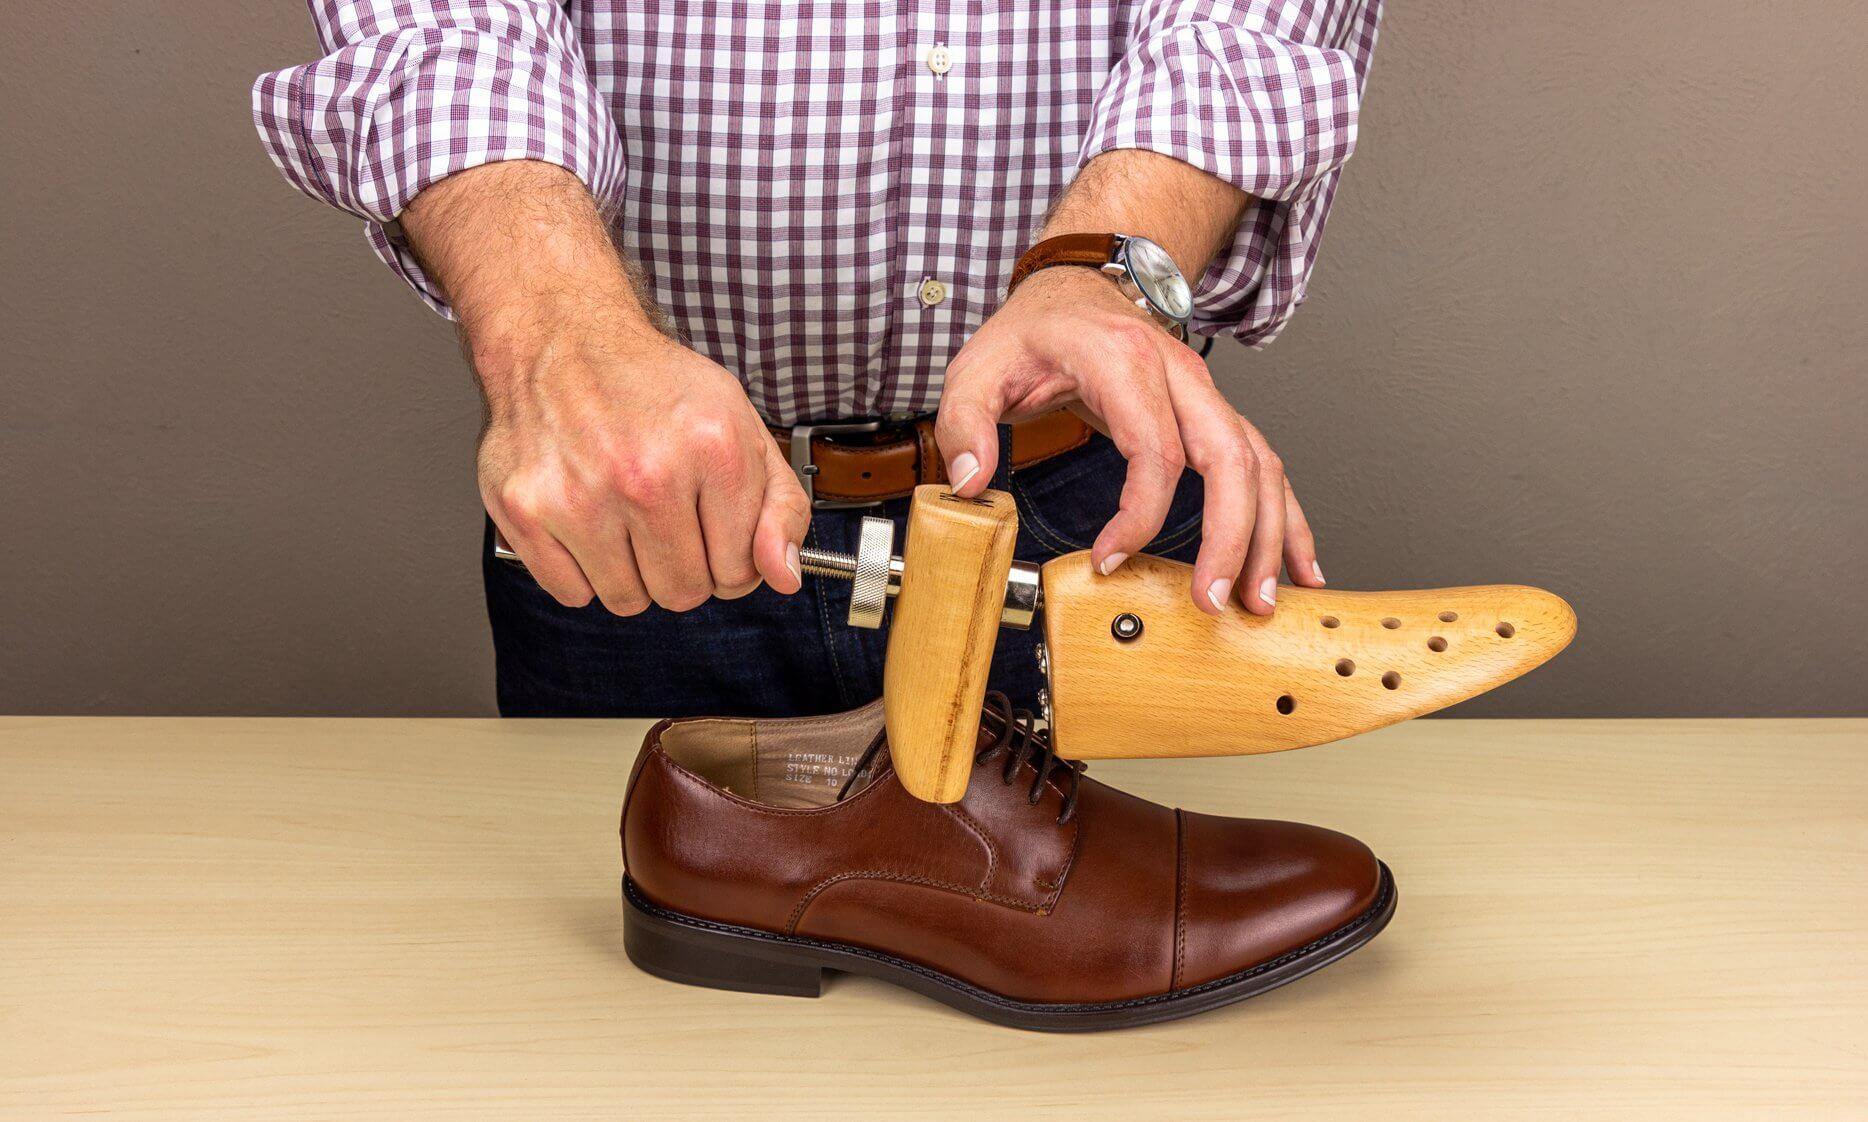 Use a Shoe Stretcher